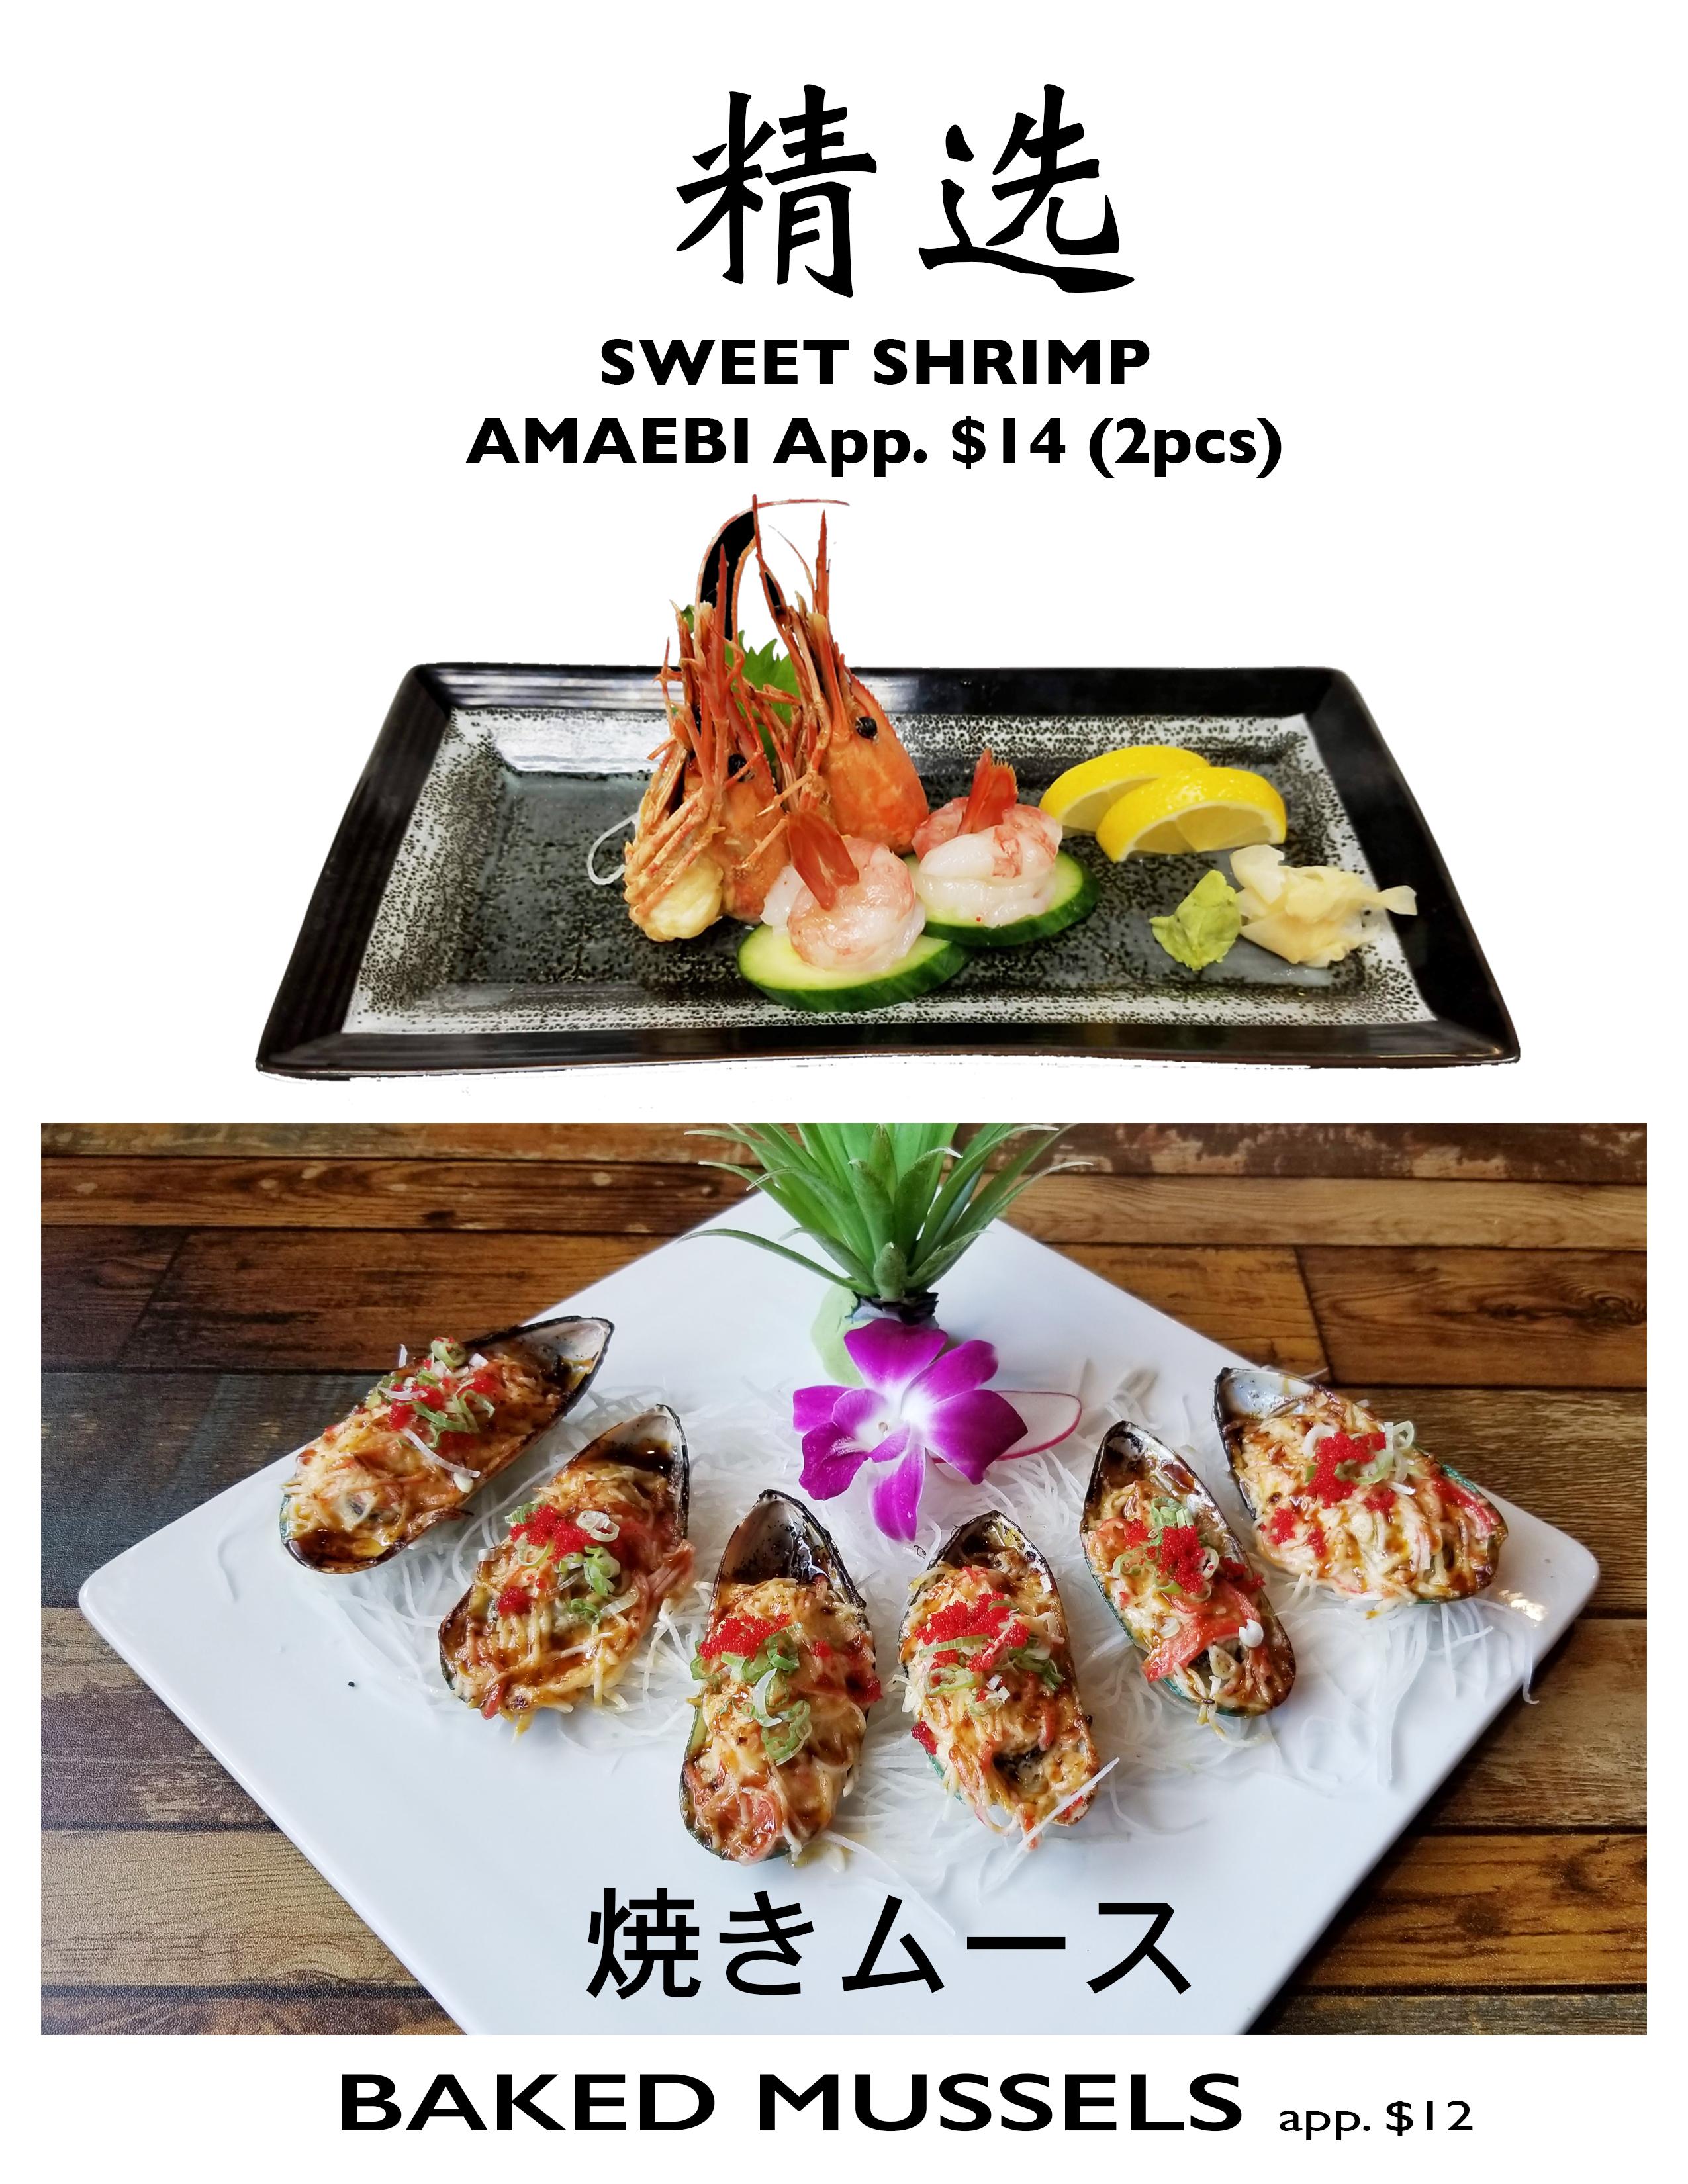 Mussels & Sweet Shrimp